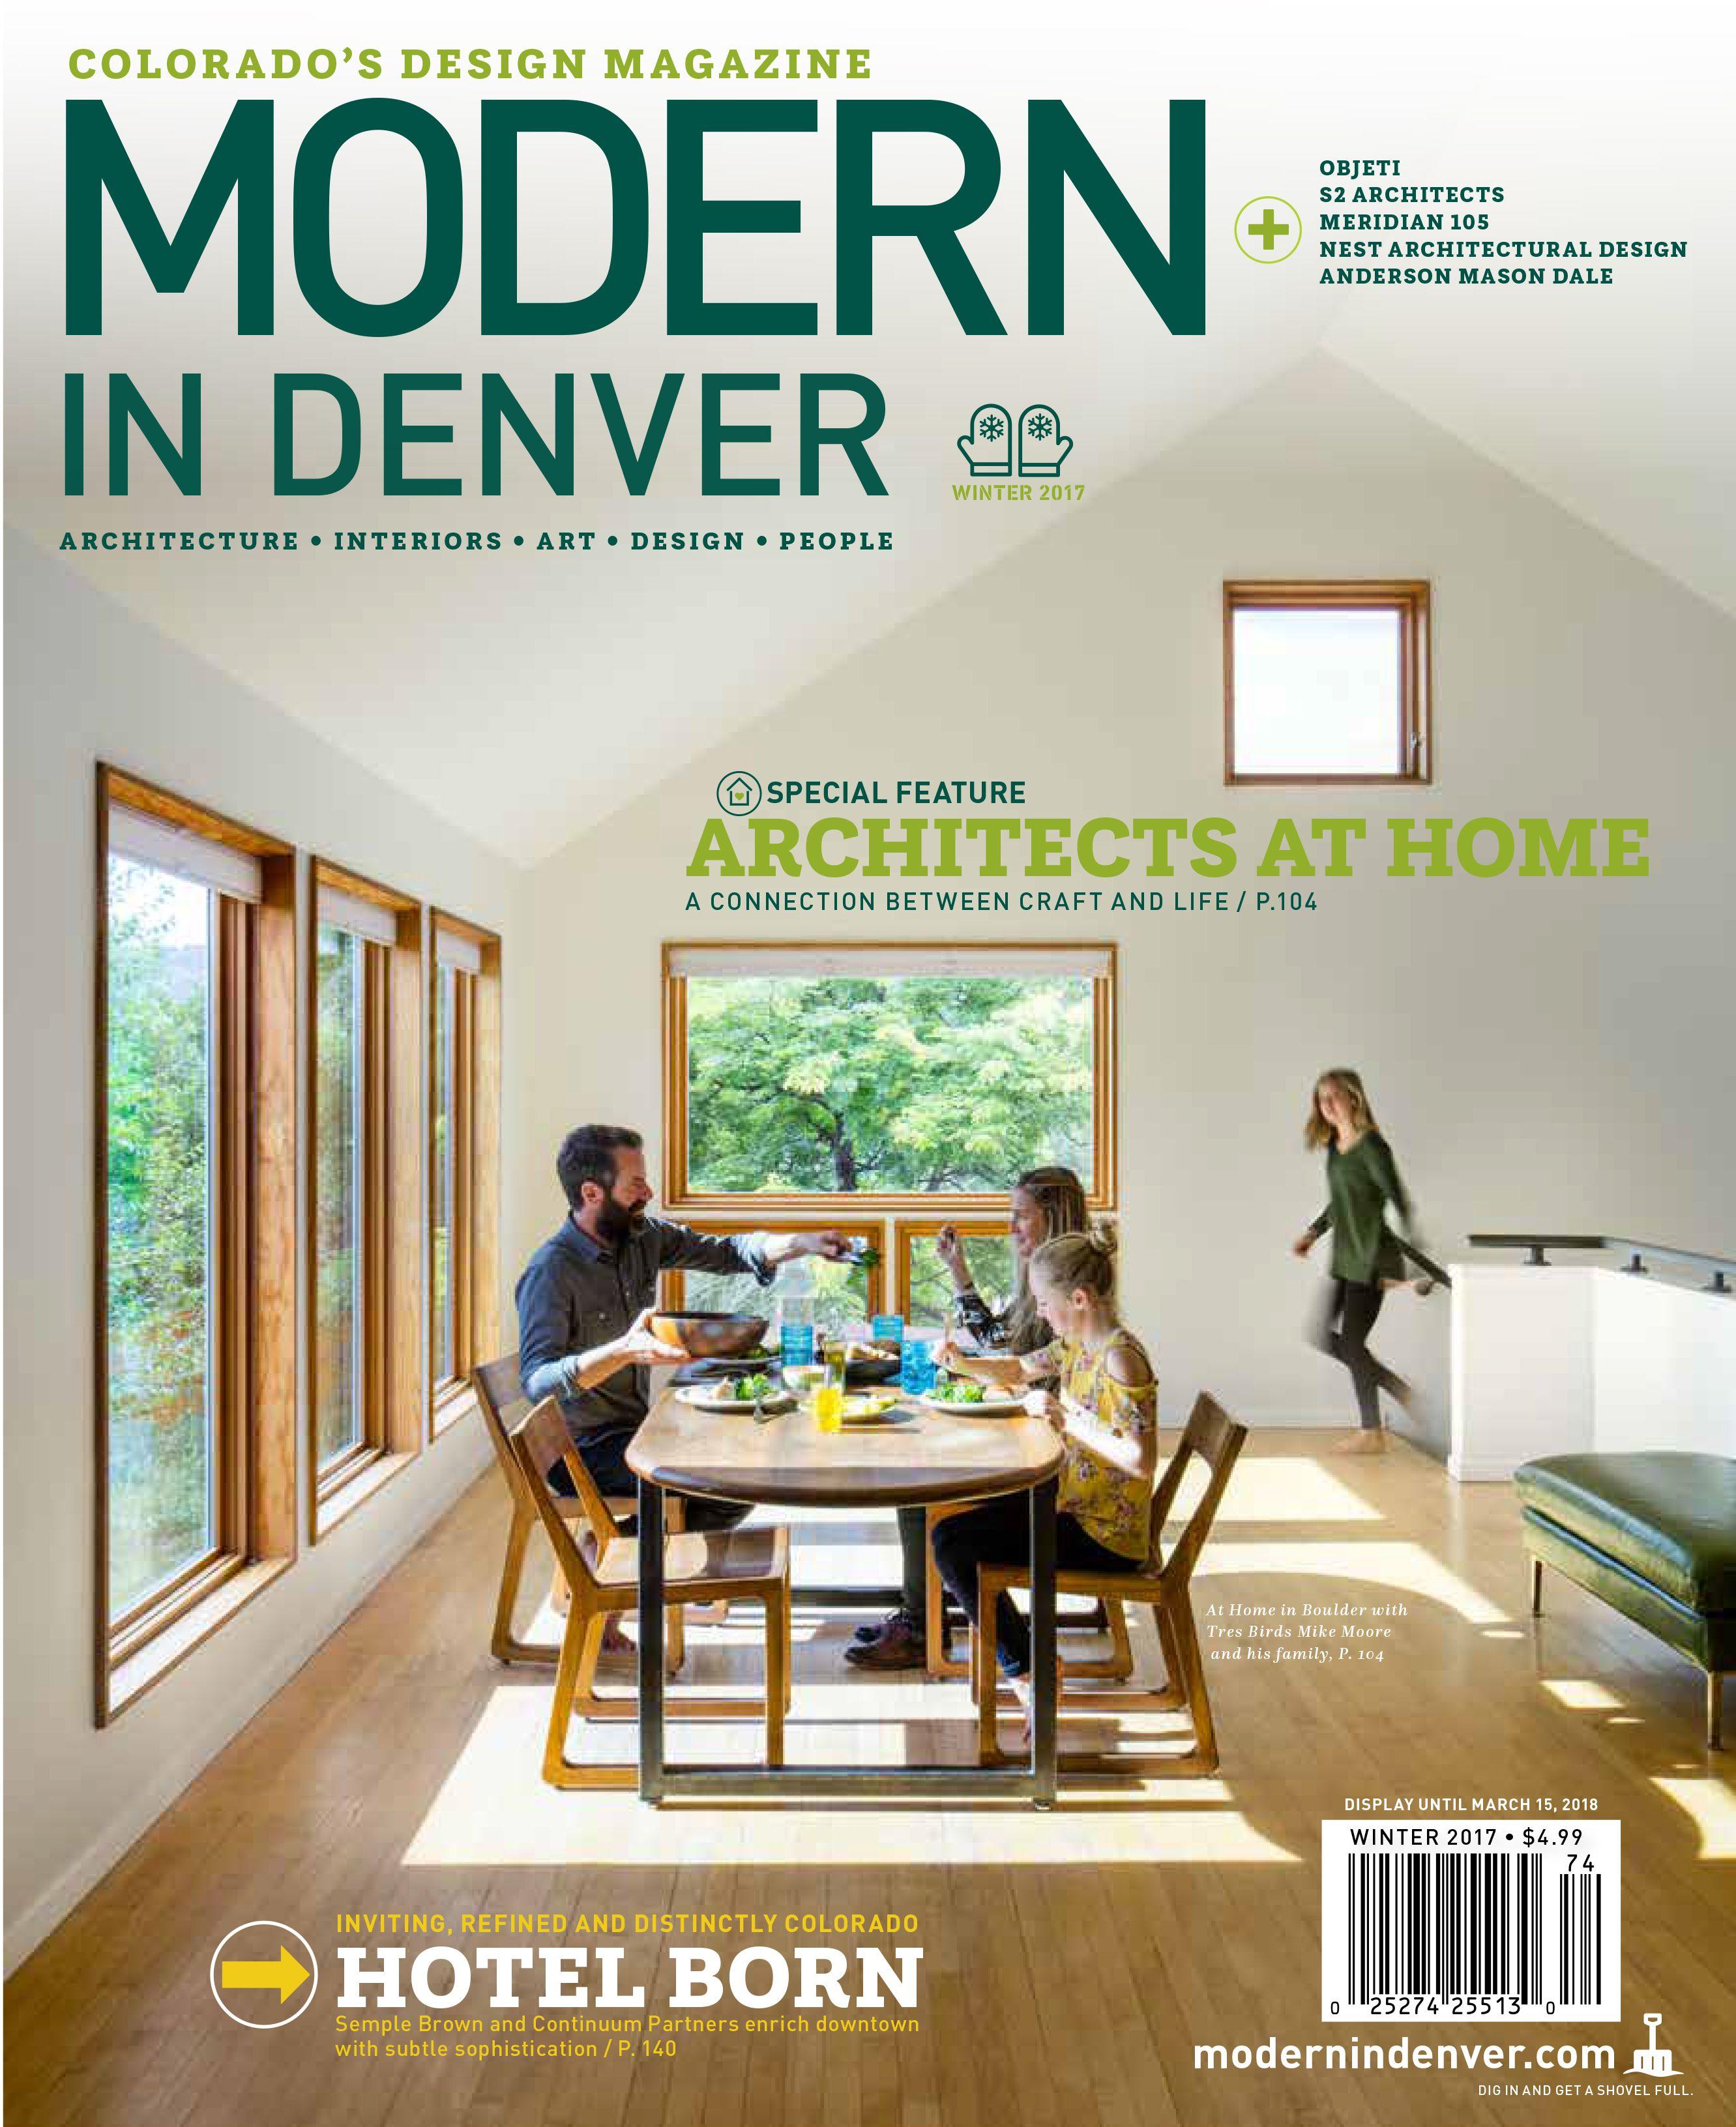 Modern In Denver 39A in 2020 Colorado design, Magazine